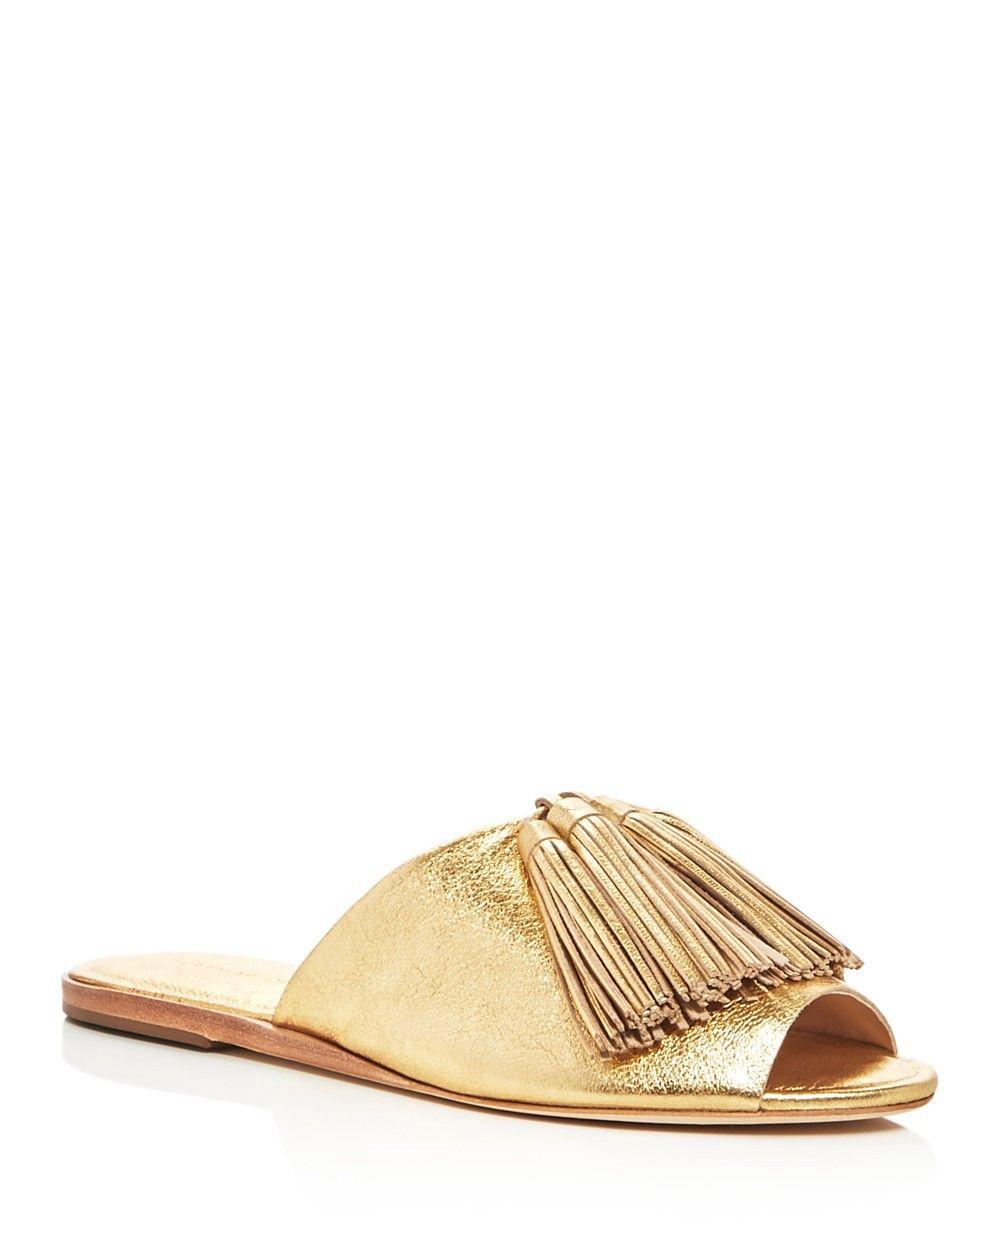 0f925e2805f8a LOEFFLER RANDALL Loeffler Randall Kiki Metallic Tassel Slide Sandals.   loefflerrandall  shoes  all